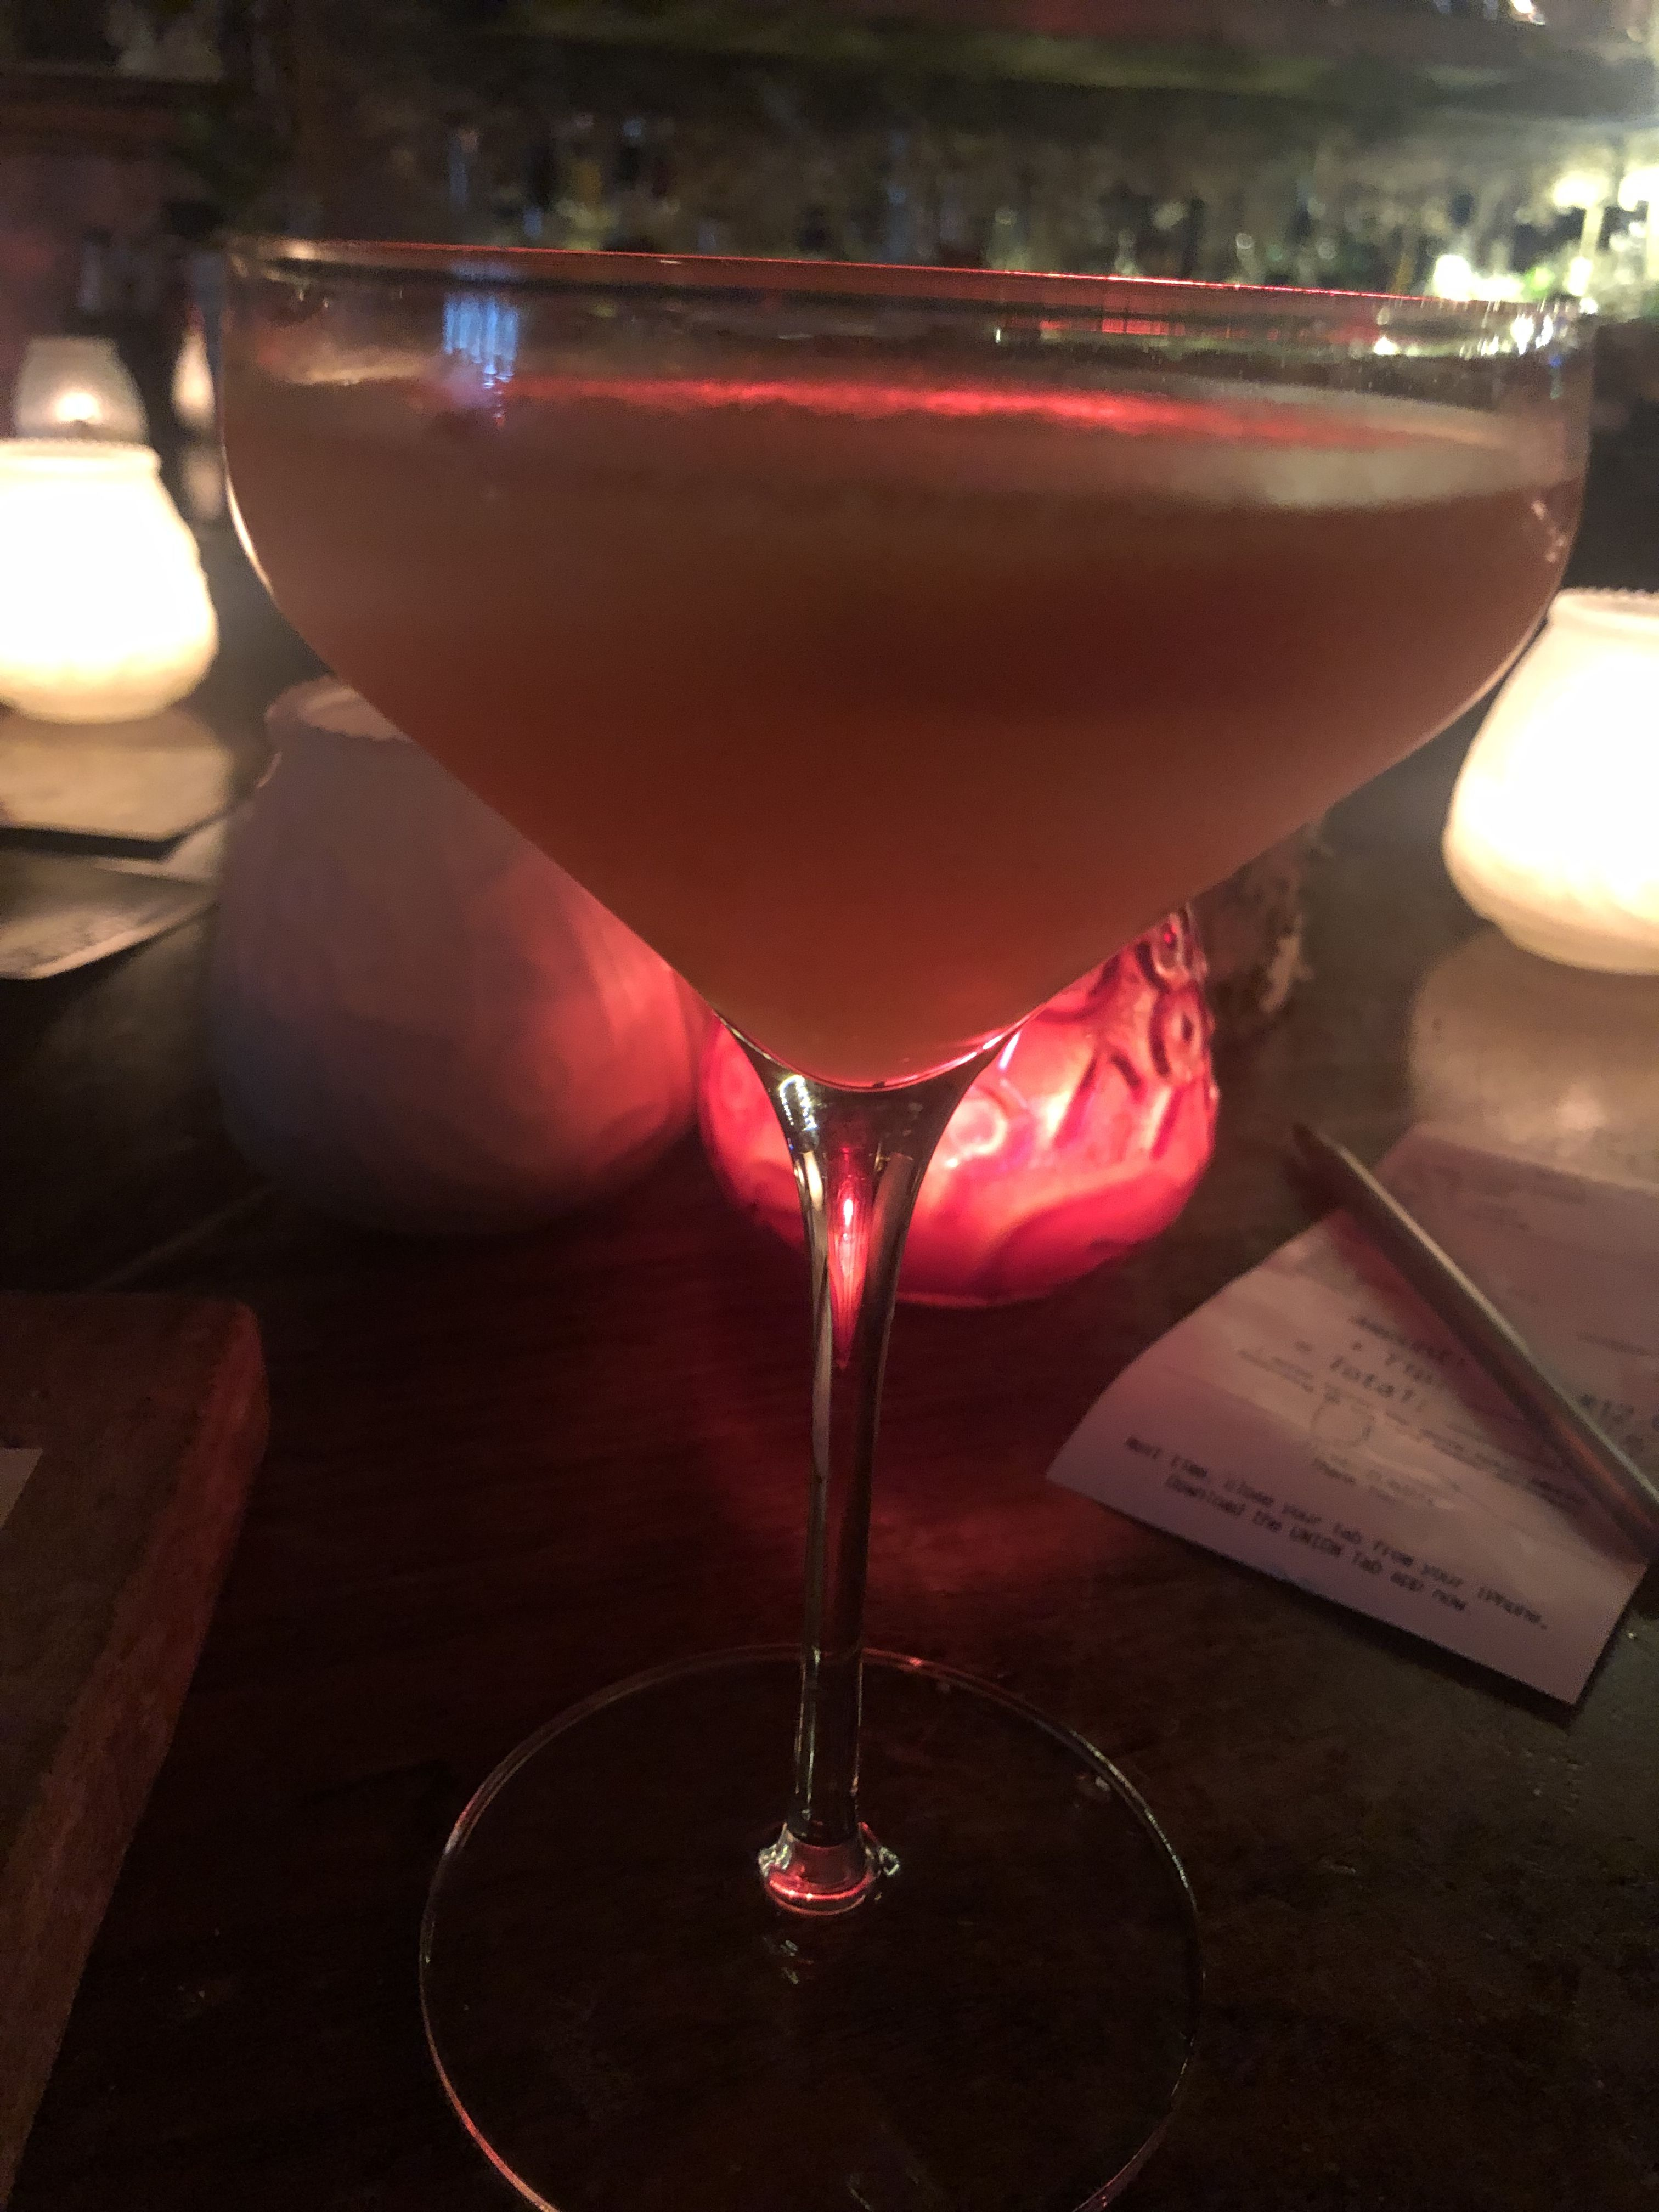 Meu Habito De Beber Sozinha Veio Das Divas Que Conheci Na Sessao Da Tarde Audrey Hepburn Marlene Dietrich Rita Haywo In 2020 Margarita Glass Martini Glass Glassware